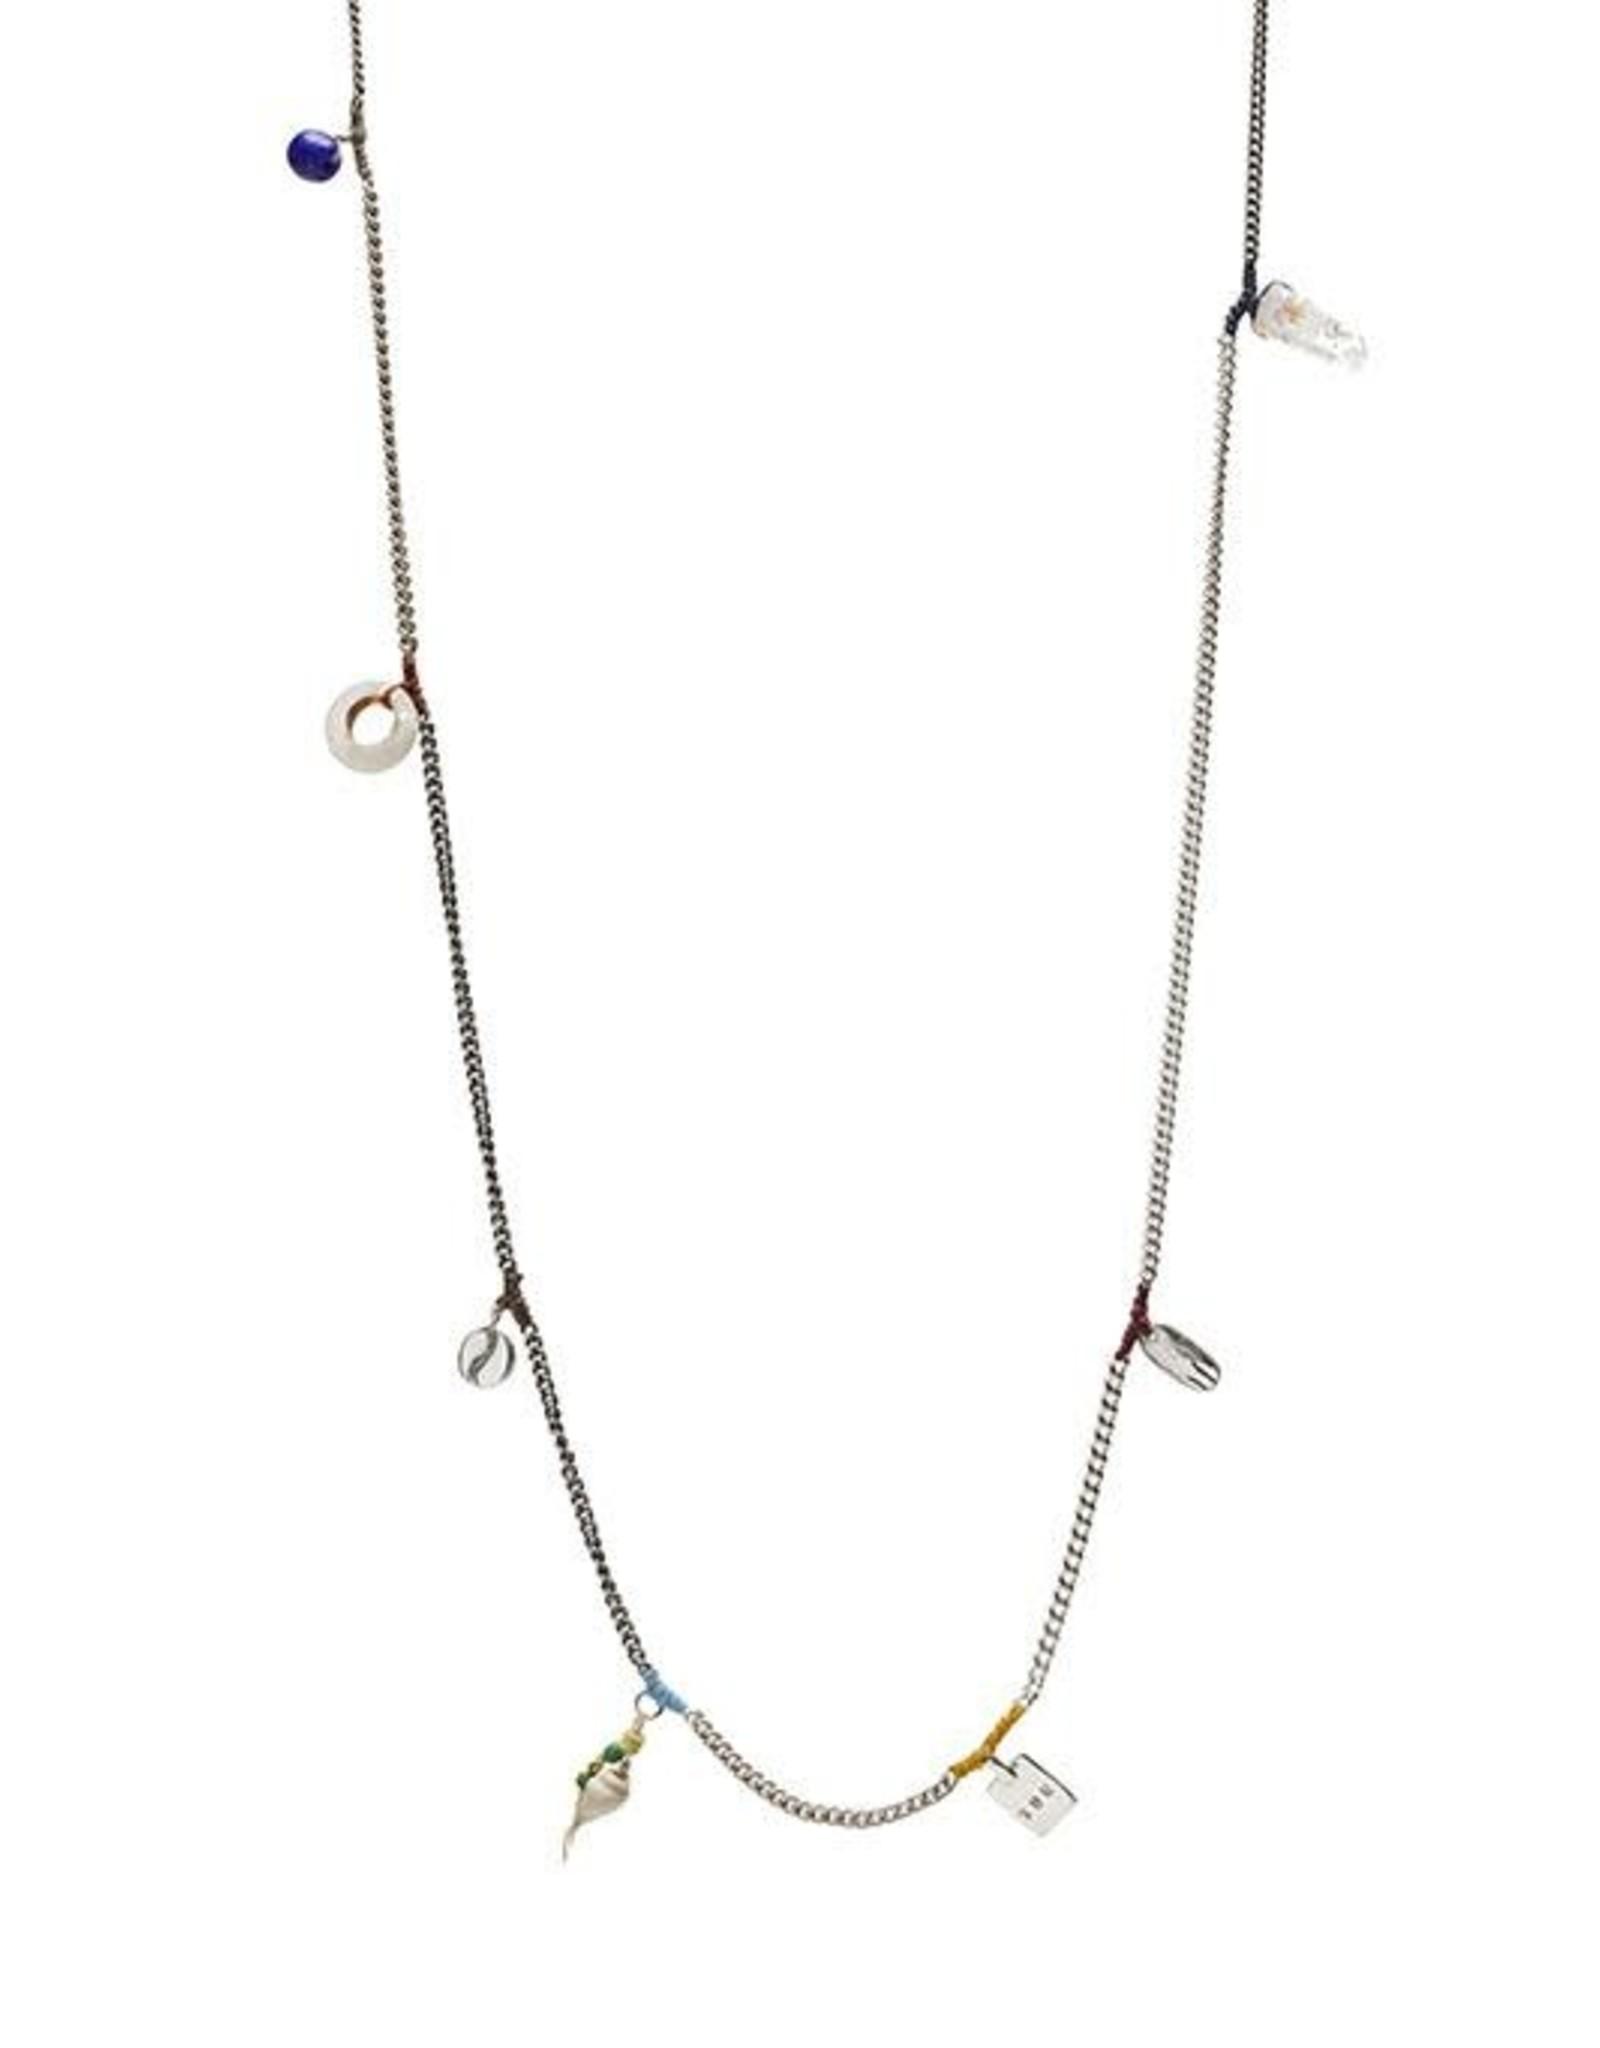 Scosha Patchwork Charms Silver Necklace